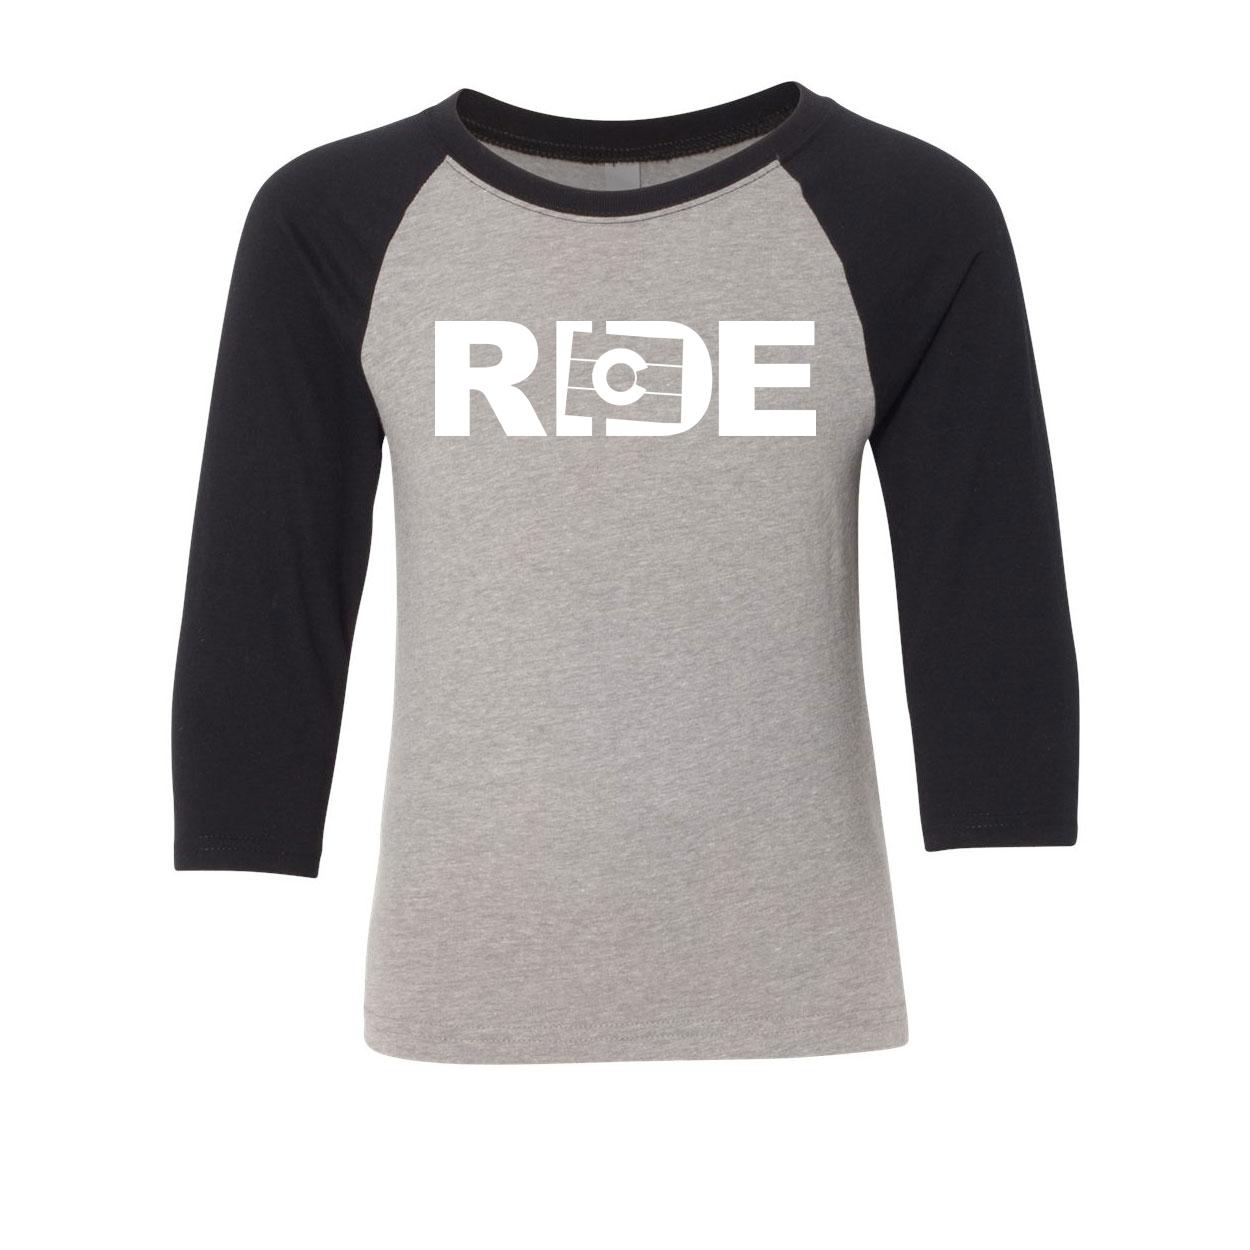 Ride Colorado Classic Youth Premium Raglan Shirt Gray/Black (White Logo)